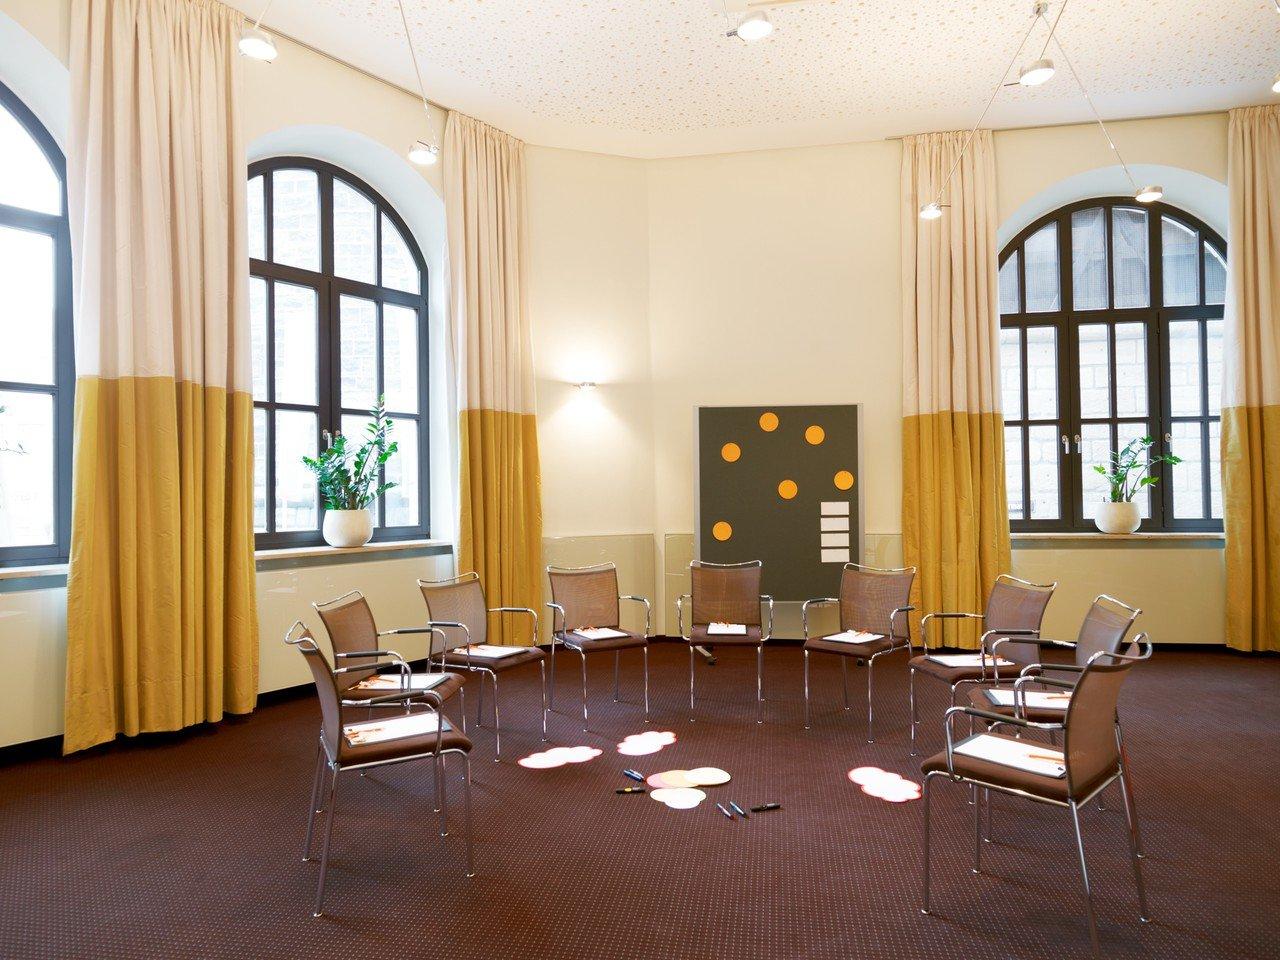 Nuremberg Train station meeting rooms Salle de réunion Hotel Victoria IdeenReich image 0